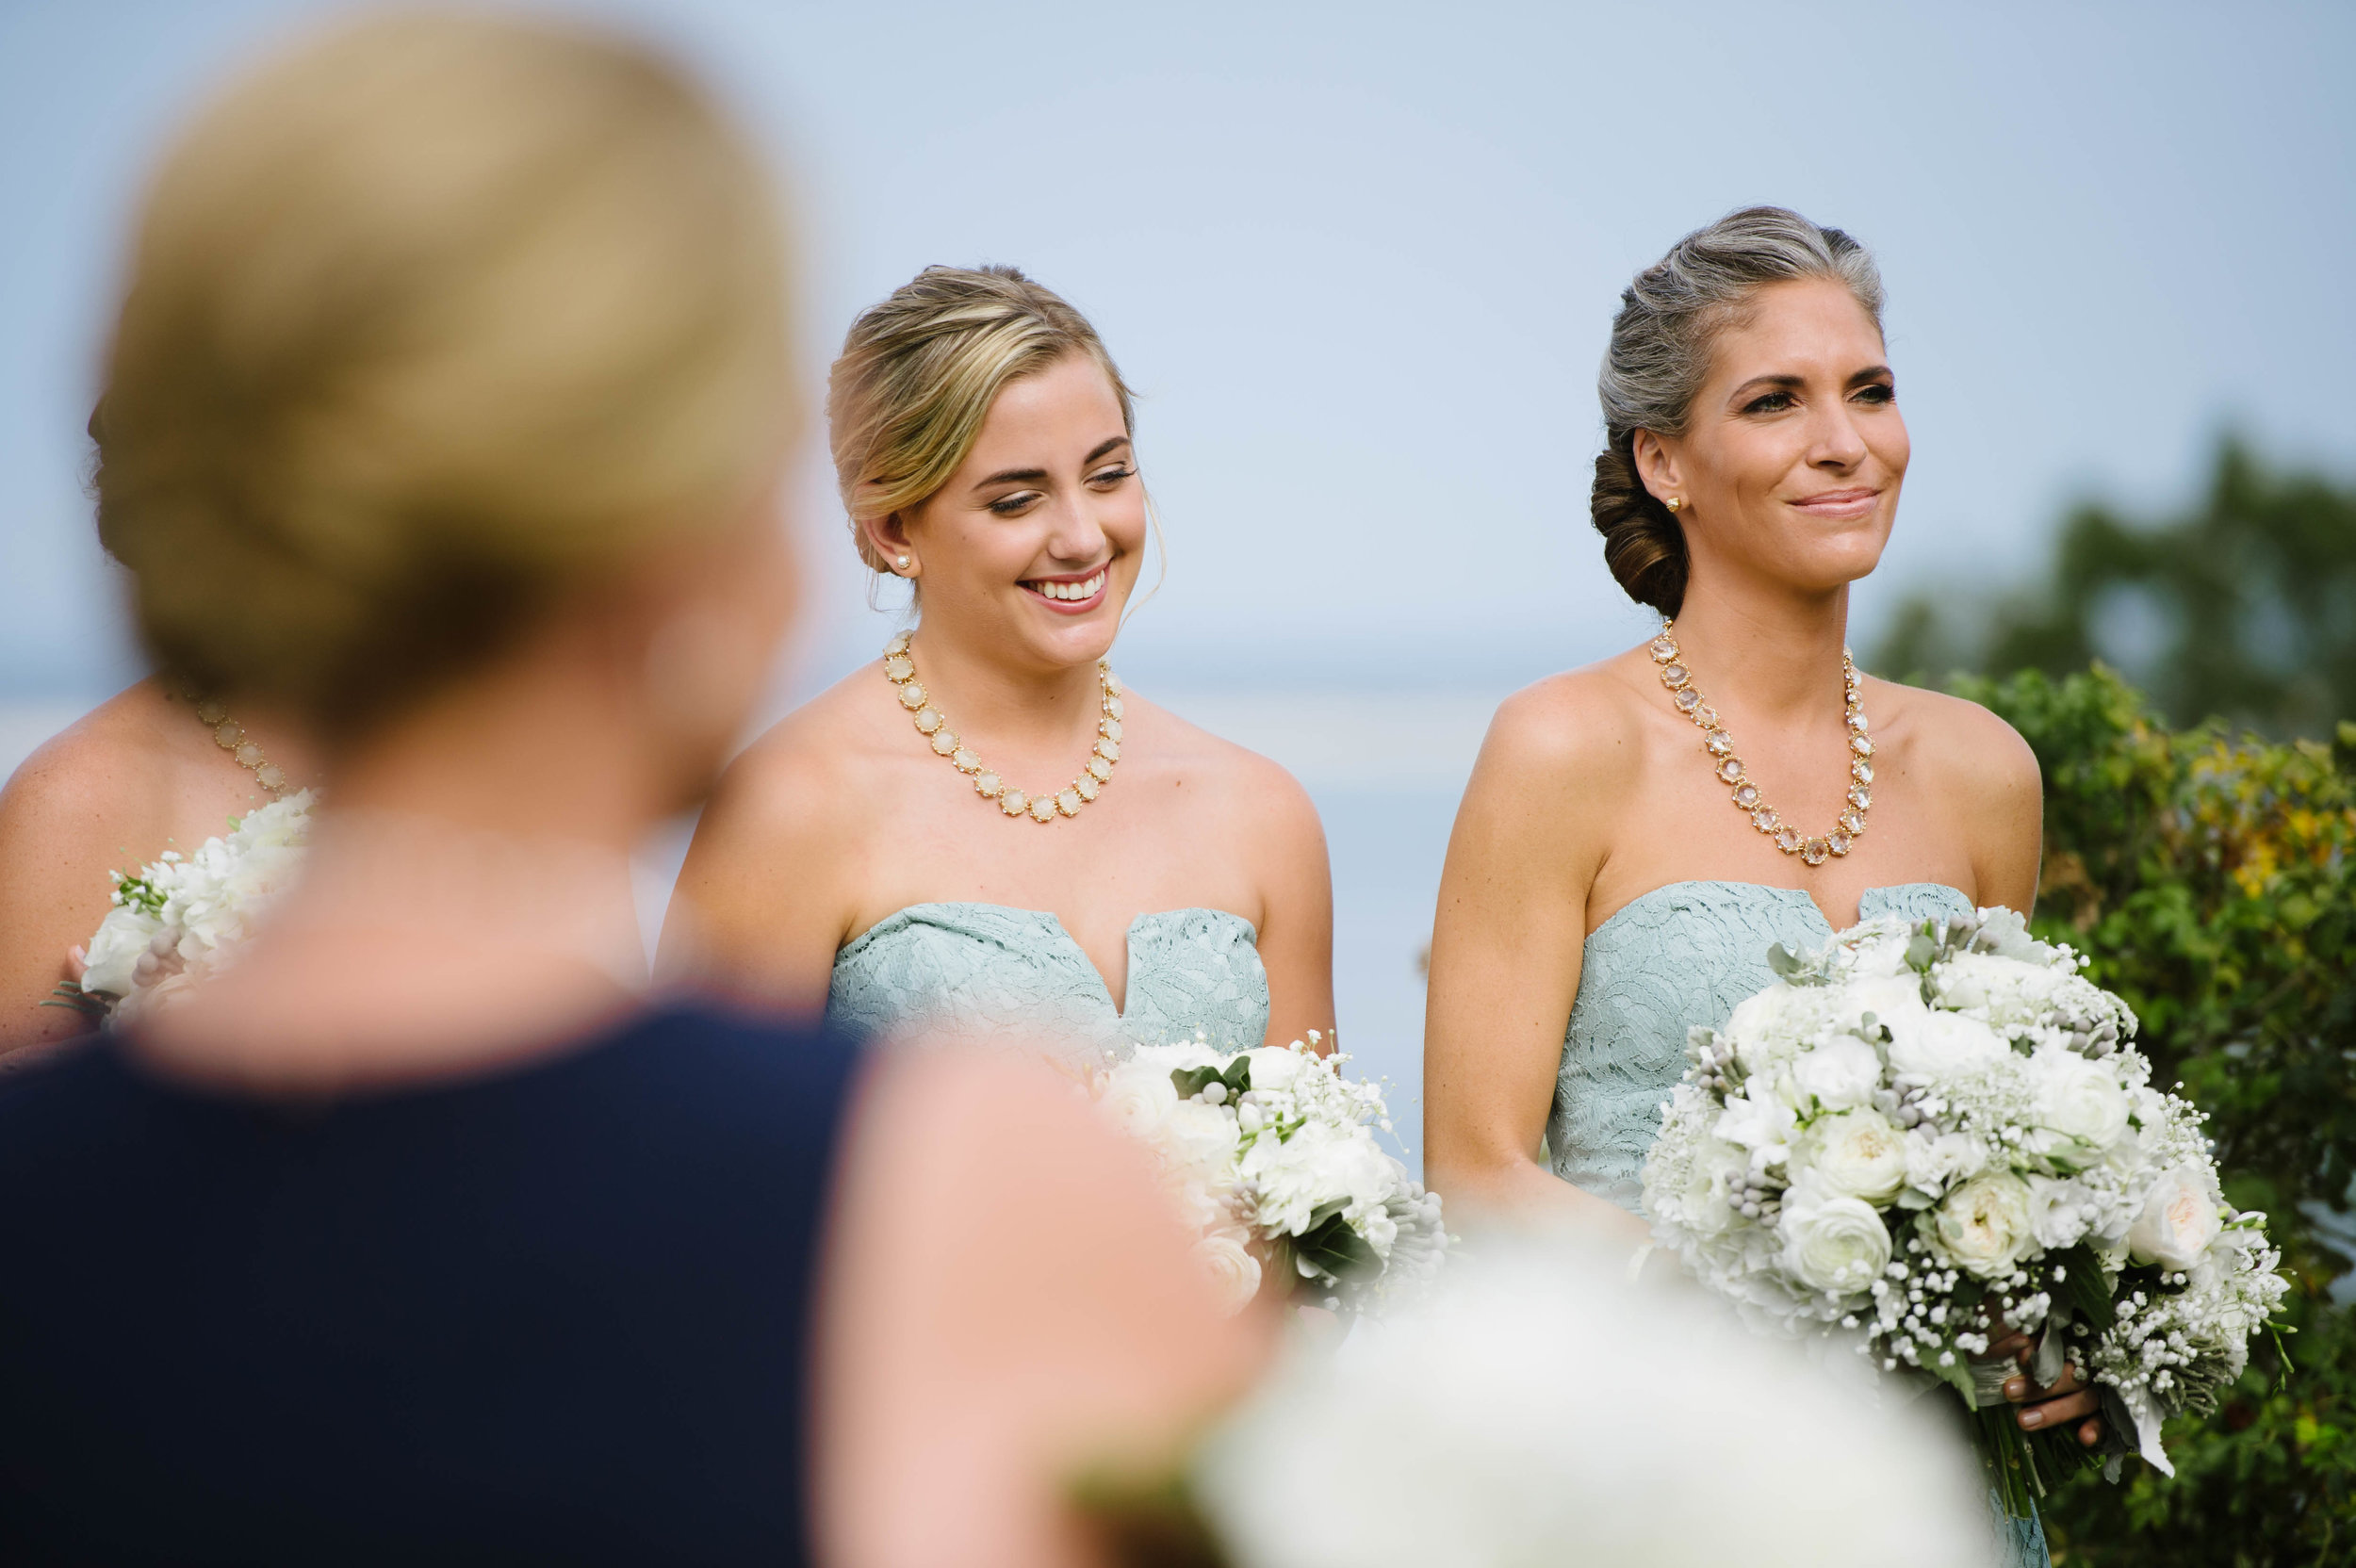 Private-Home-Wedding023.jpg